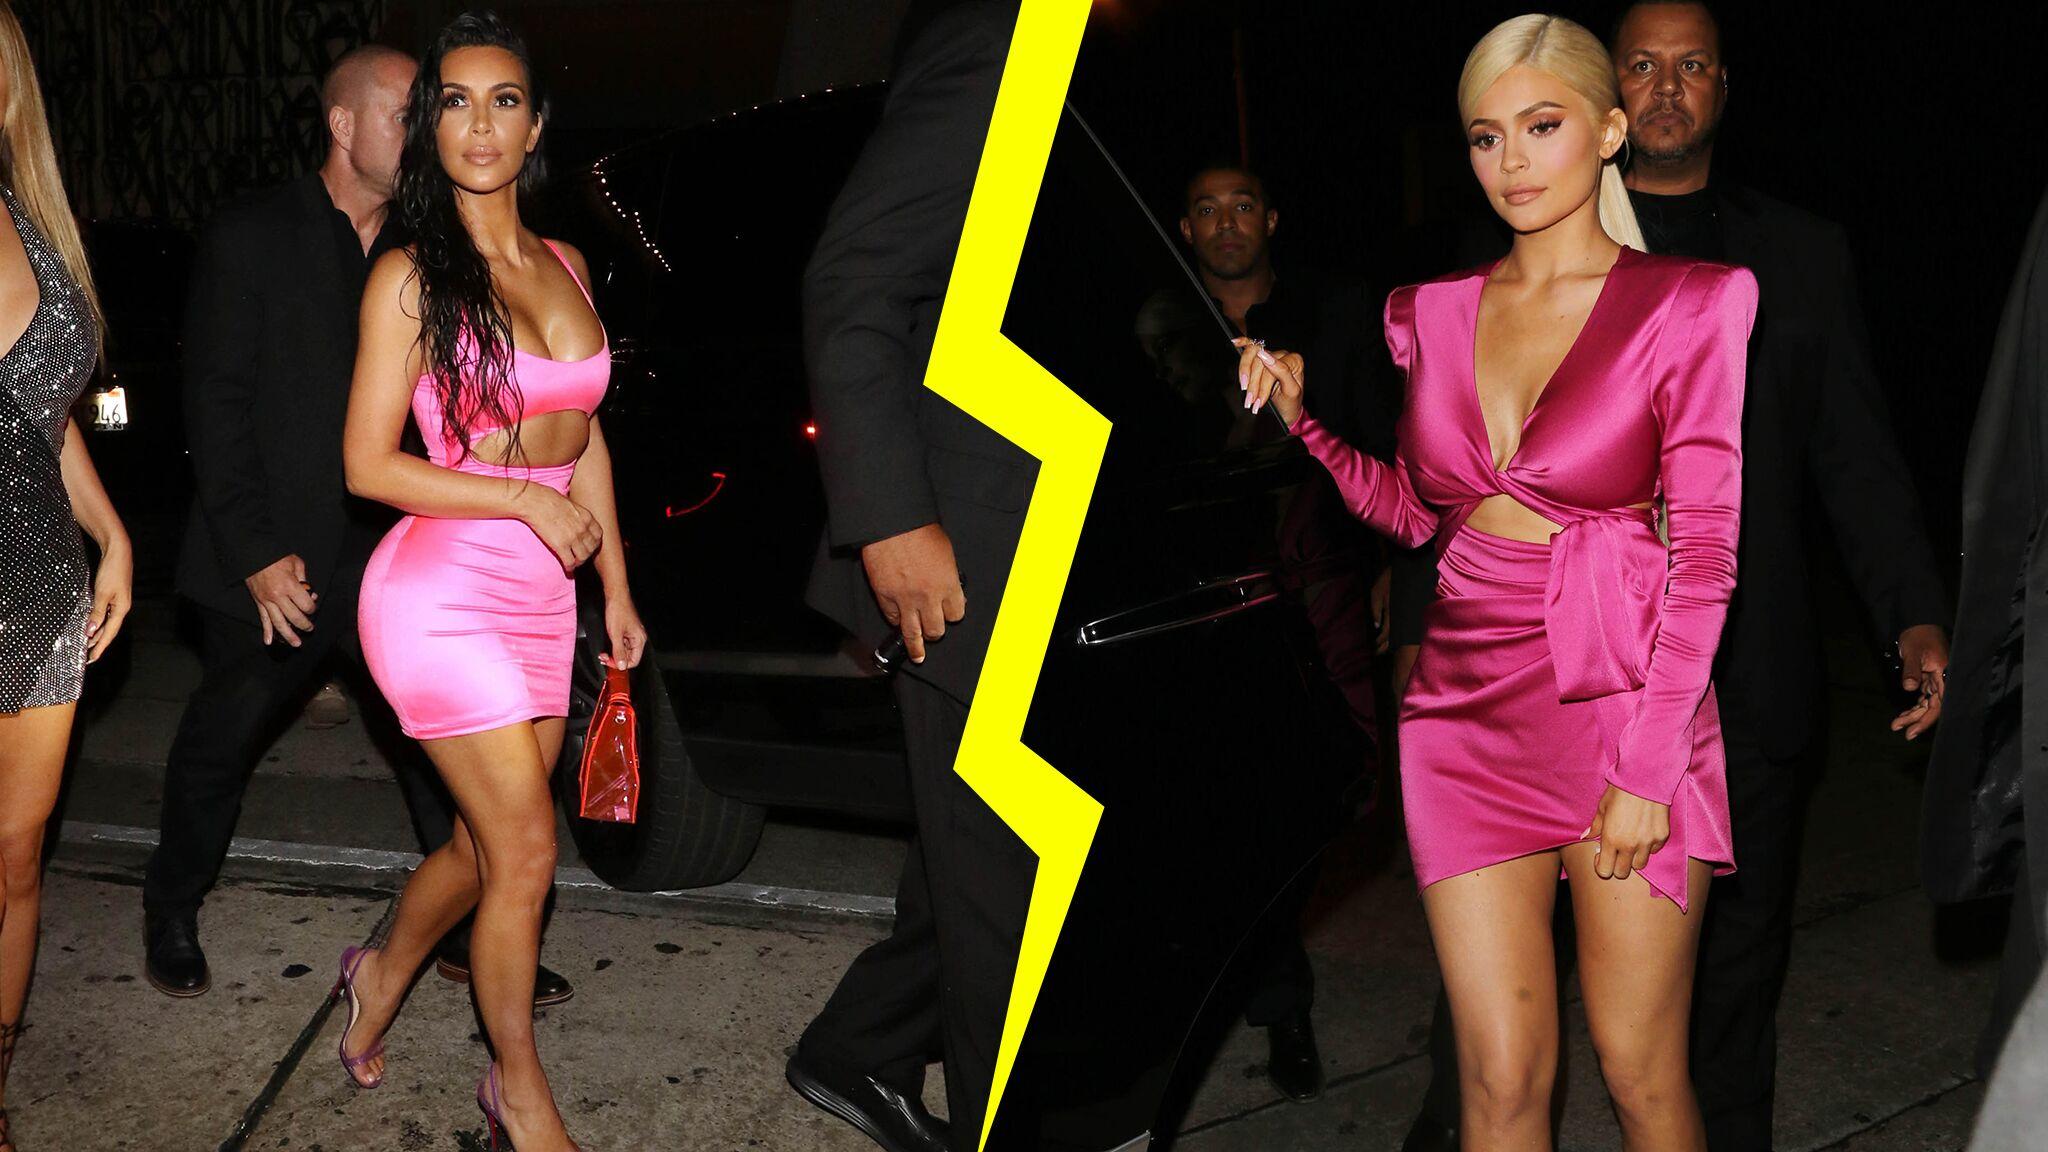 Fashion Battle – Qui gagne entre Kim Kardashian et Kylie Jenner?